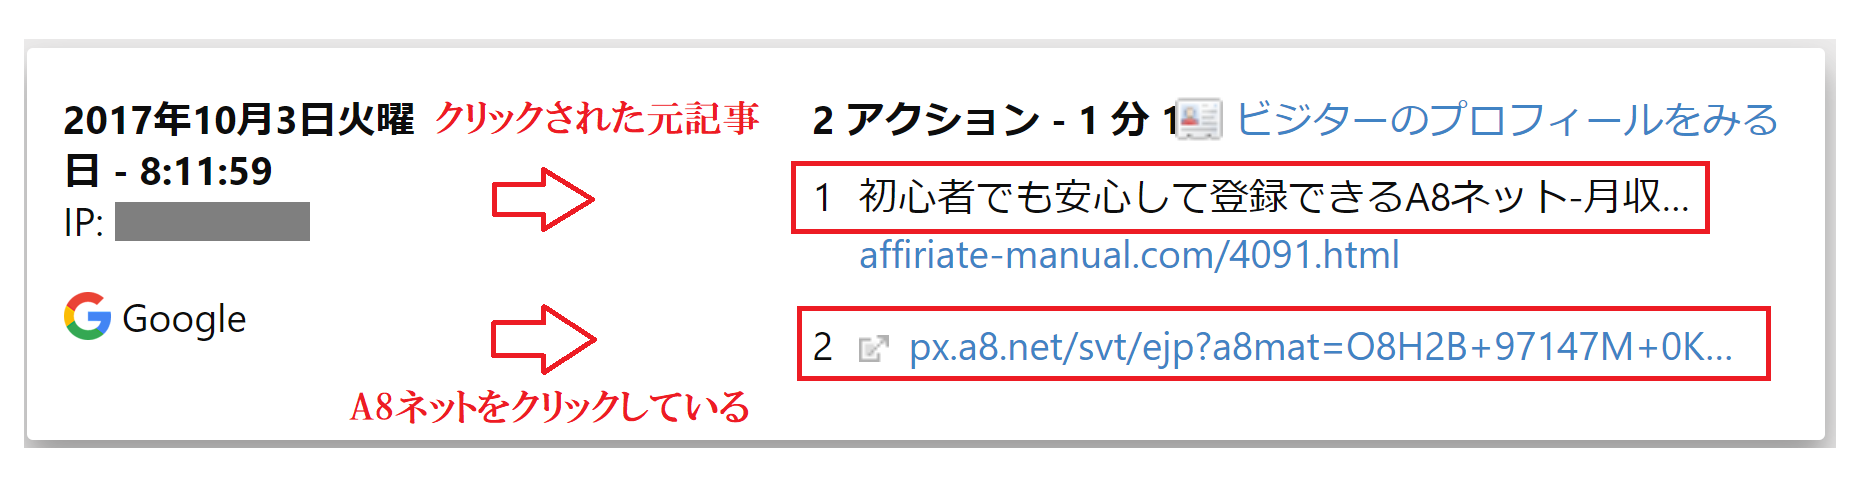 piwikのアクセスデータからアフィリエイトリンクがクリックされた元記事を特定